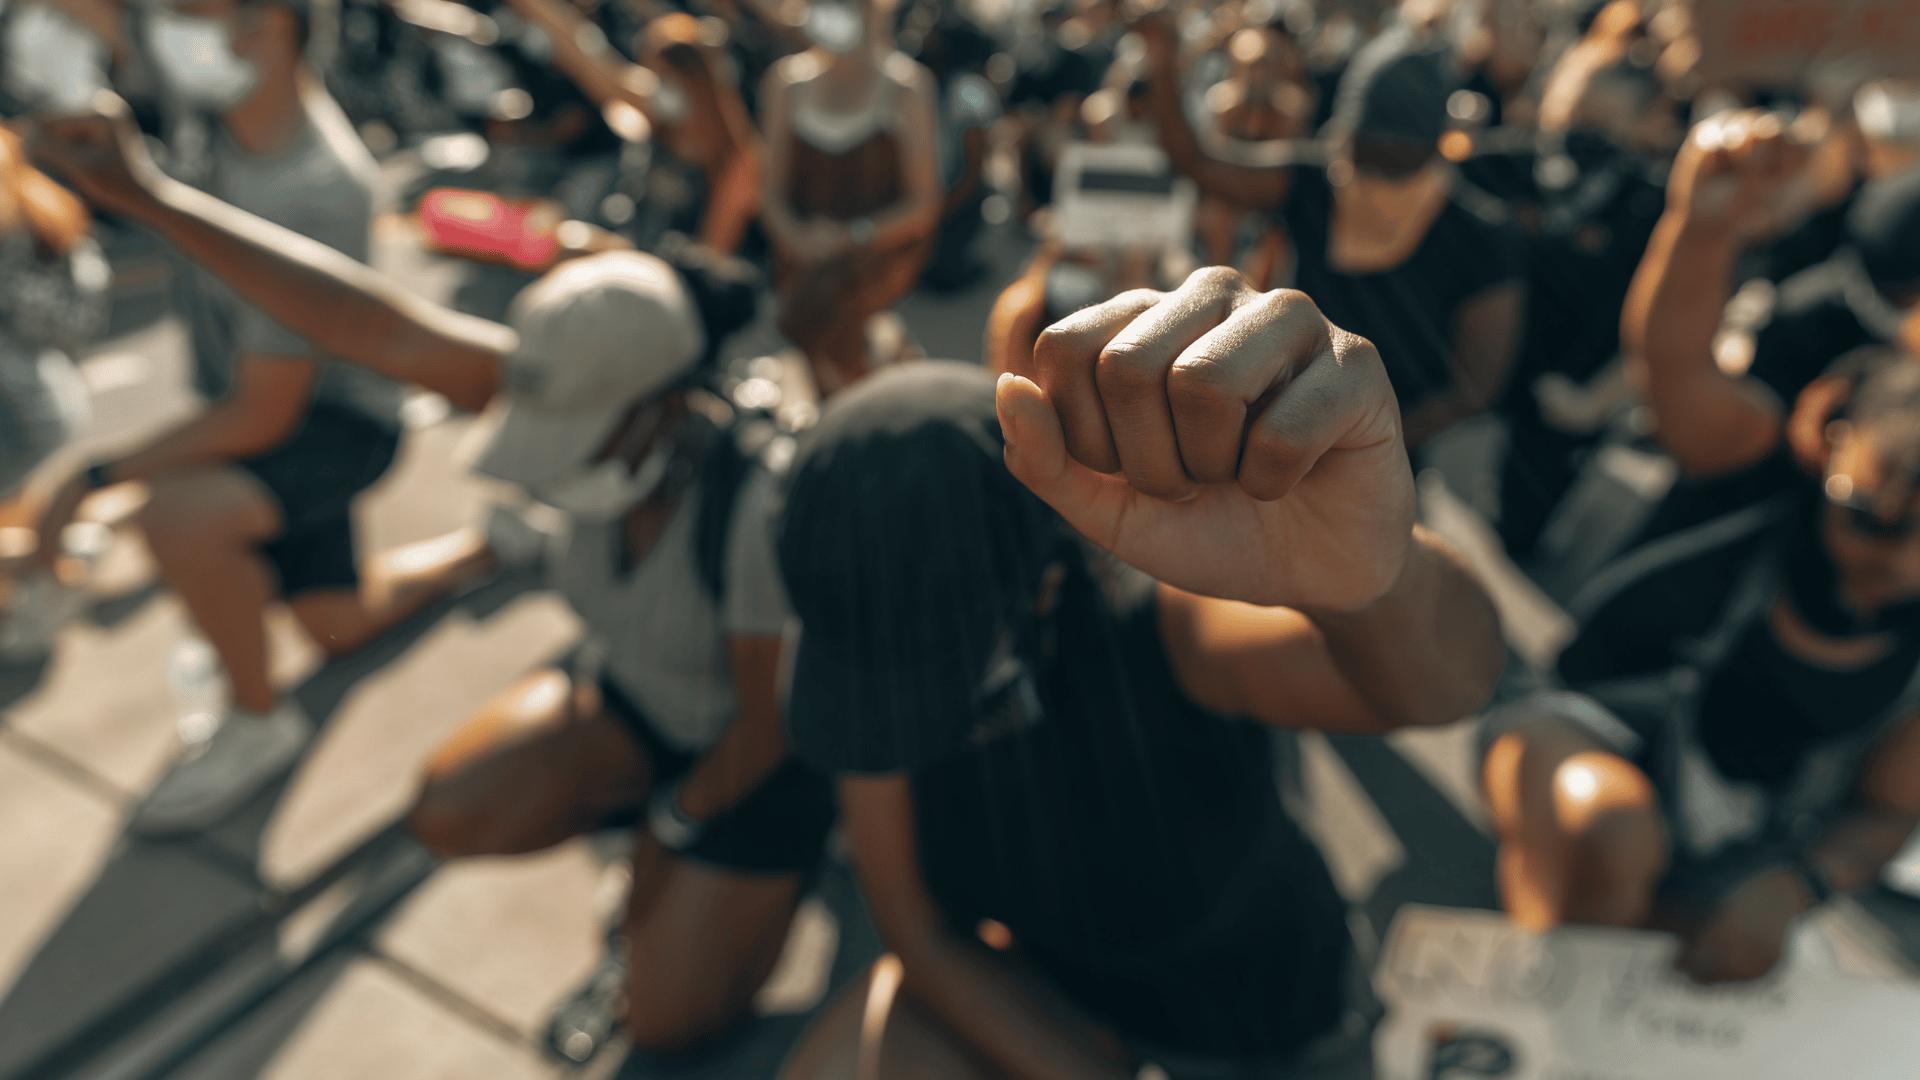 fist raised close to the camera